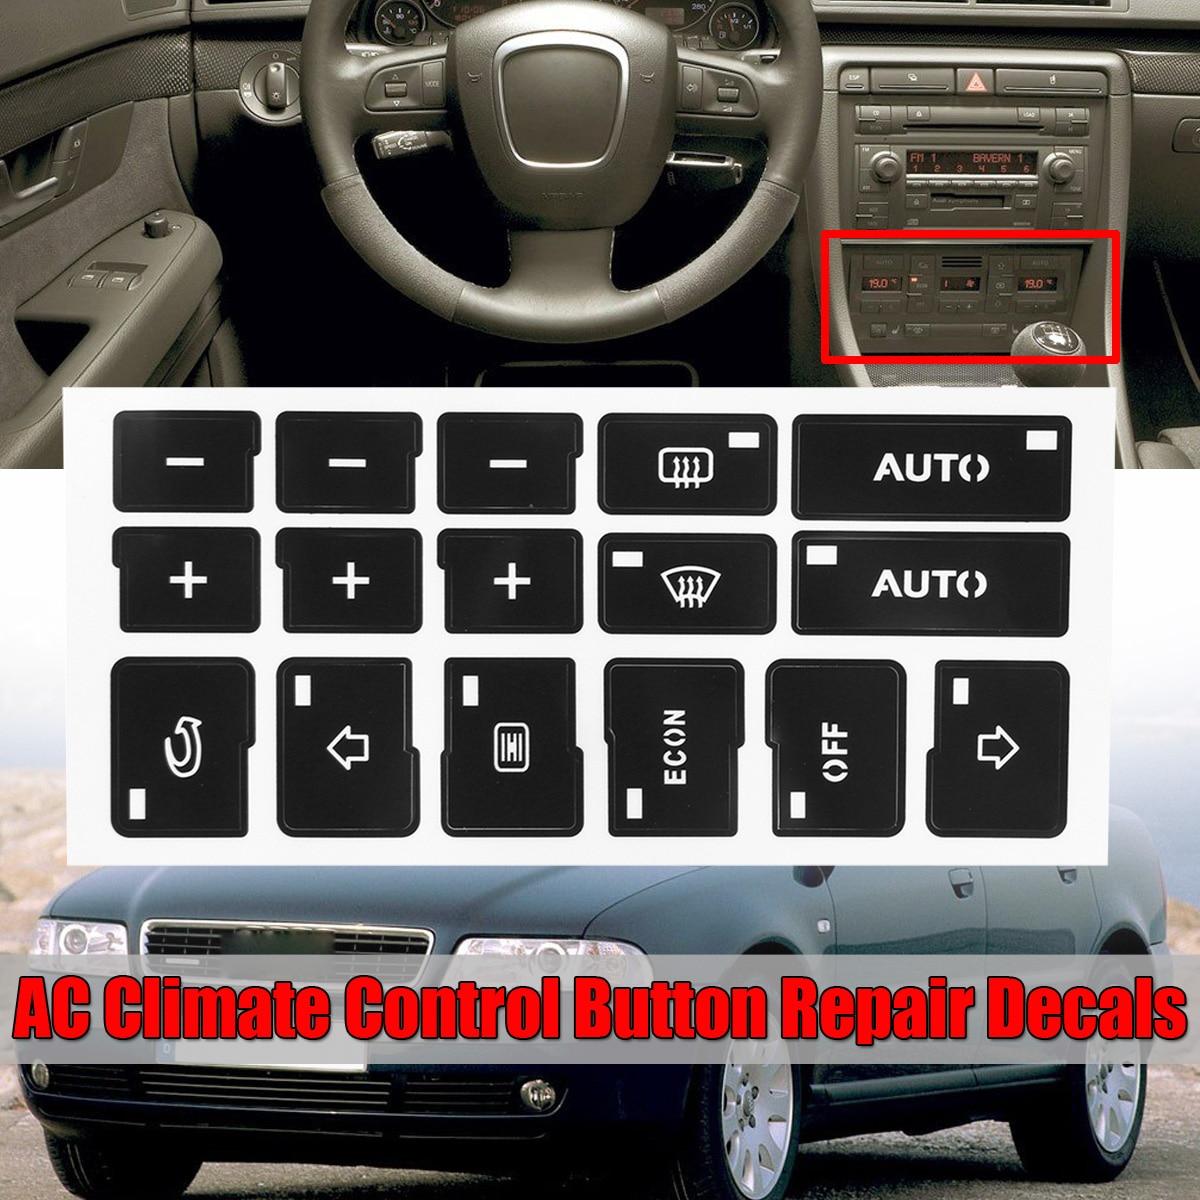 New 1x / 2x Car Air Condition AC Climate Control Button Repair Sticker Decals For Audi A4 B6 B7 2000 2001 2002 2003 2004